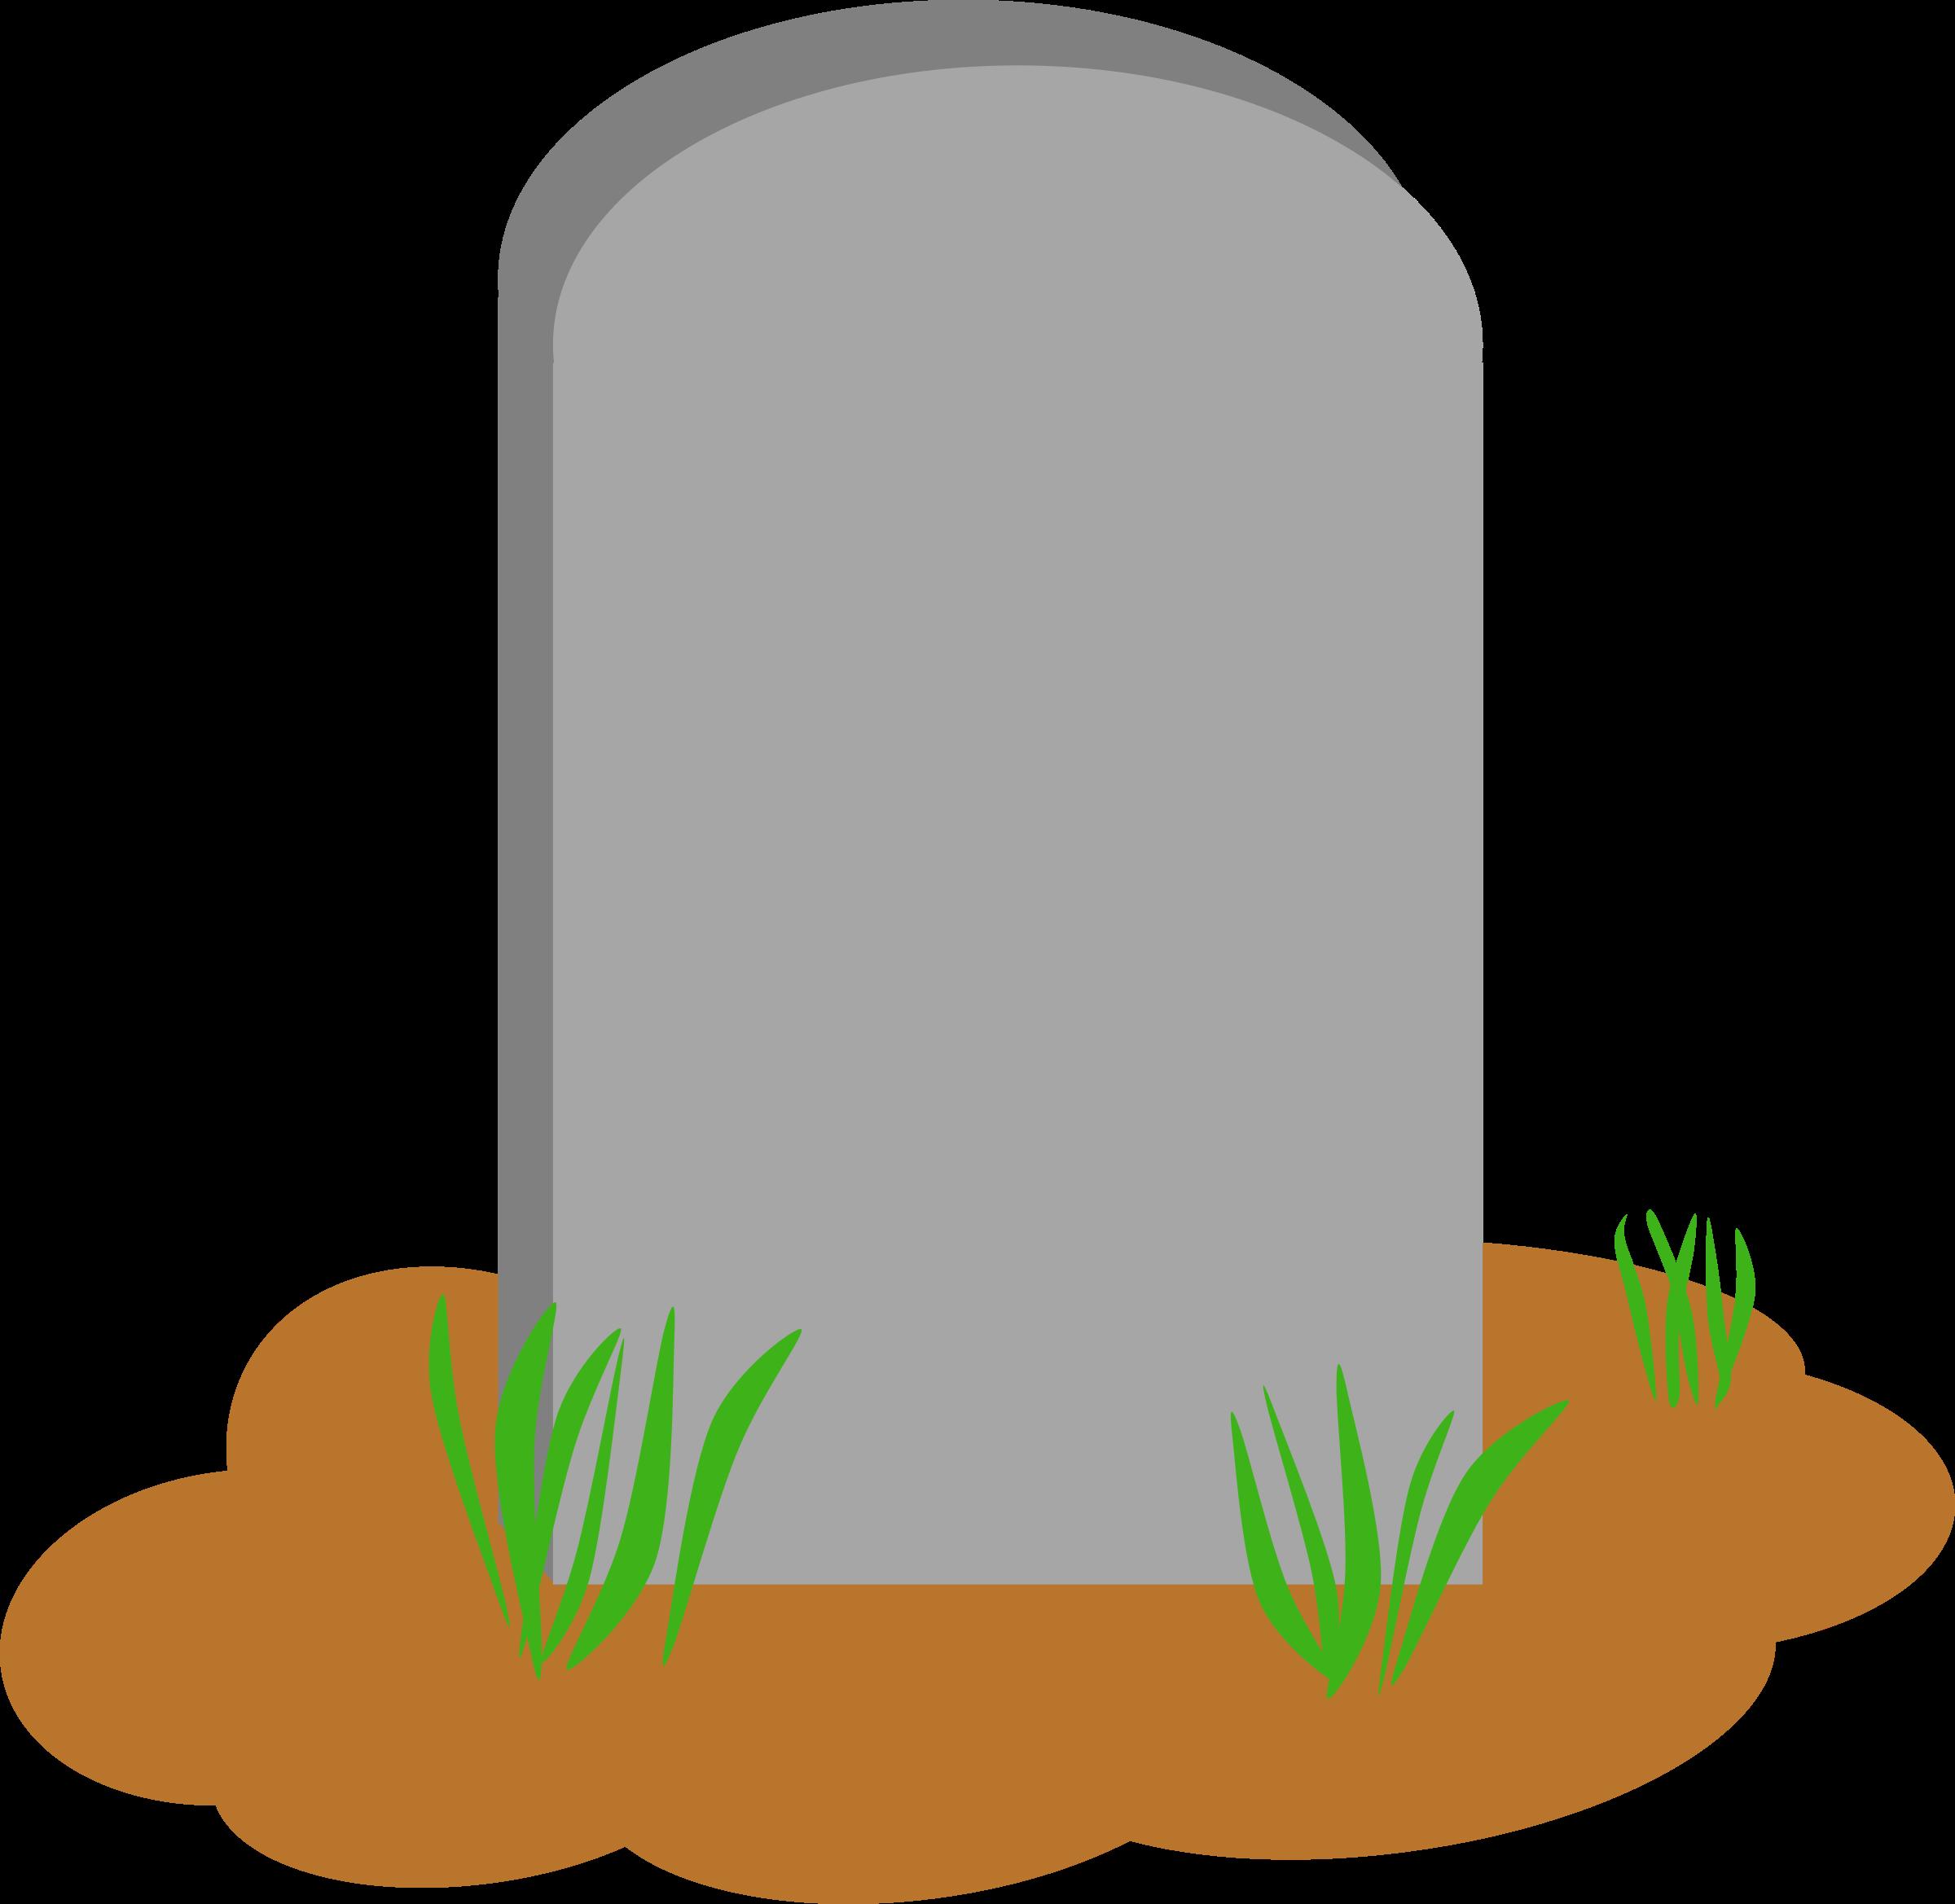 clip art library stock Graveyard clipart gravesite. Big image png